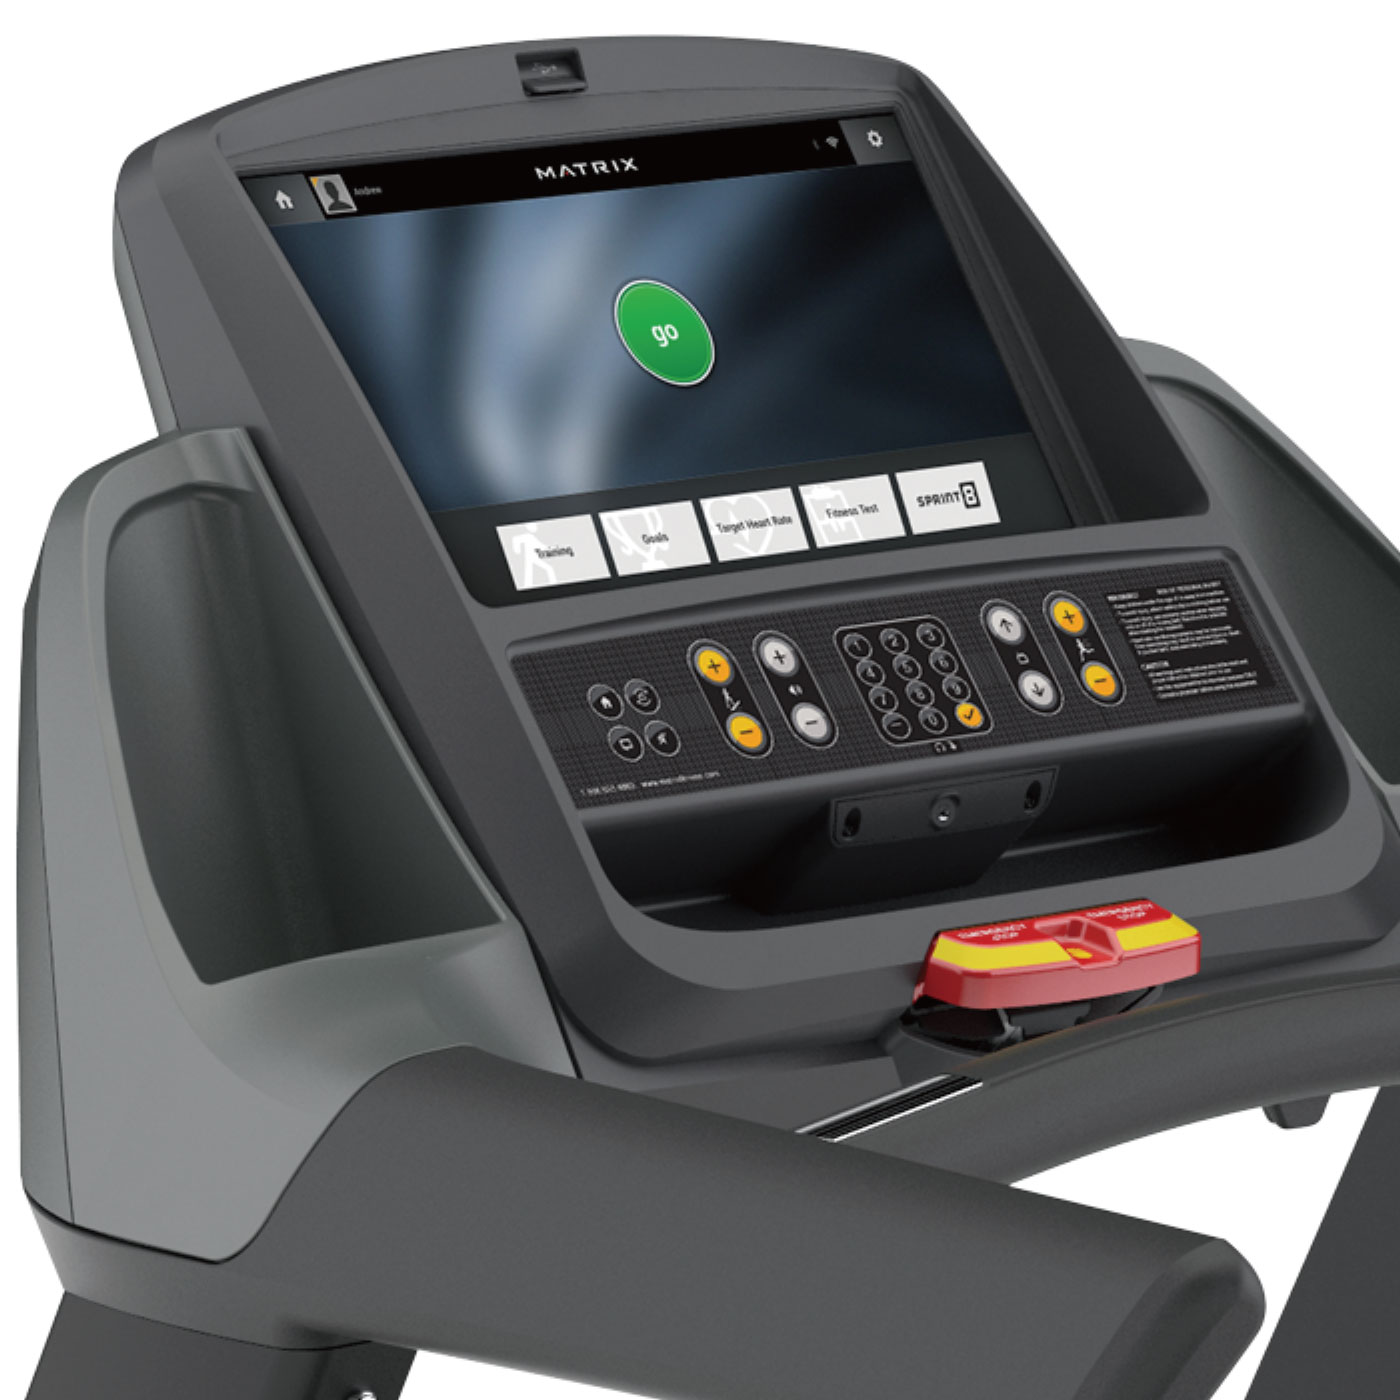 T3xe/業務用ランニングマシン〈業務用MATRIX〉《ジョンソンヘルステック》